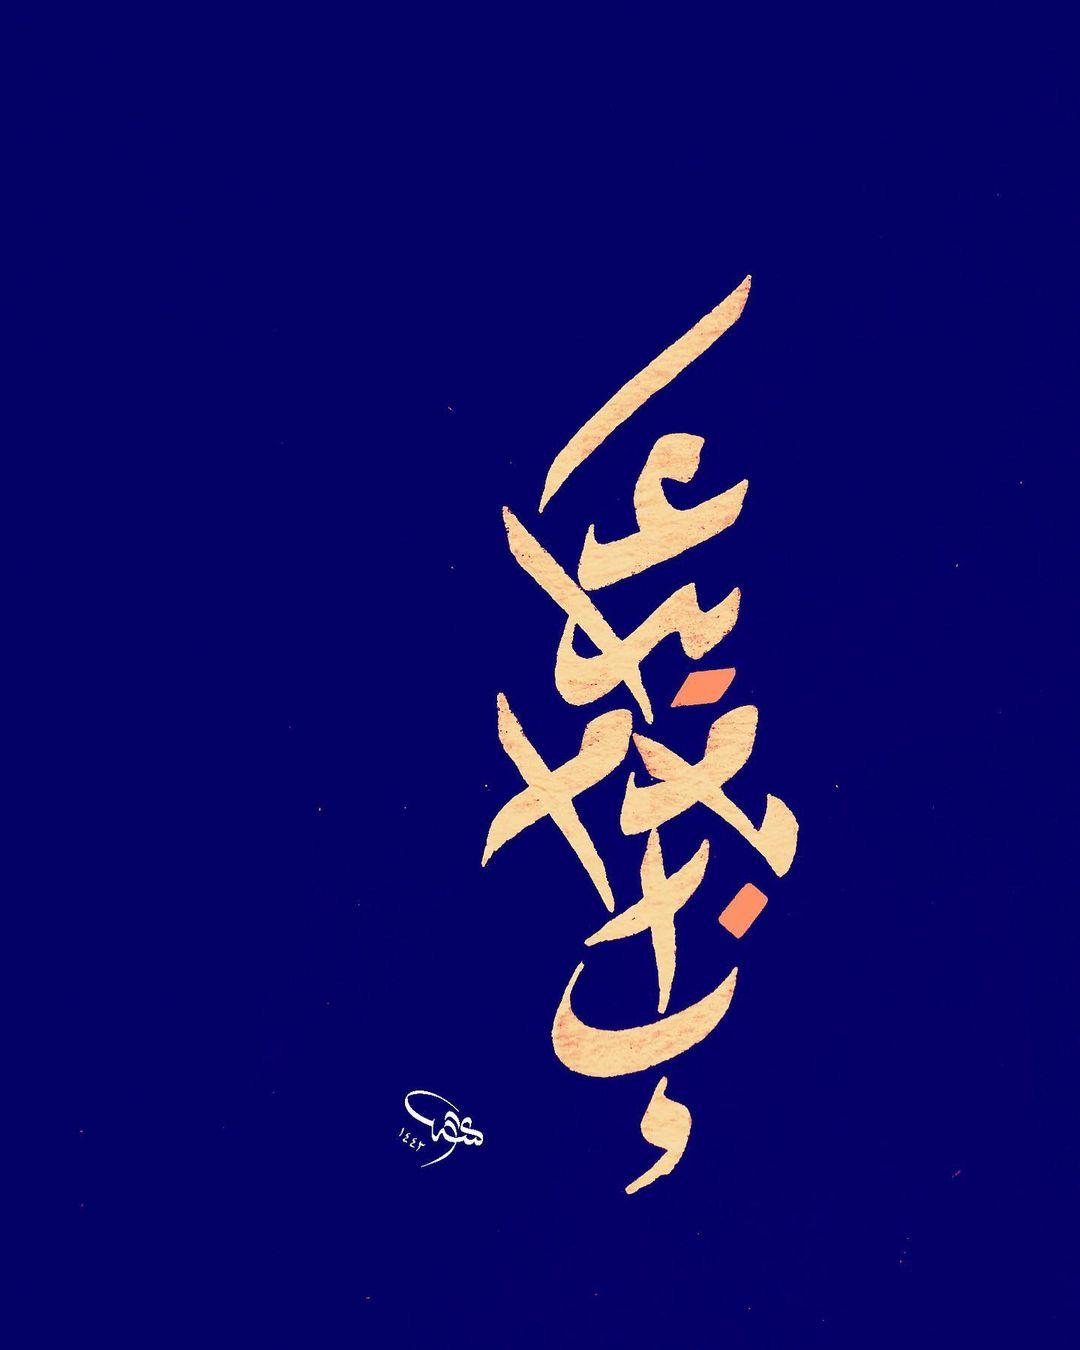 Donwload Photo عيدكم مبارك #عيدكم_مبارك #arabiccalligraphy #islamiccalligraphy #tezhip #hüsnü...- hattat_aa 1